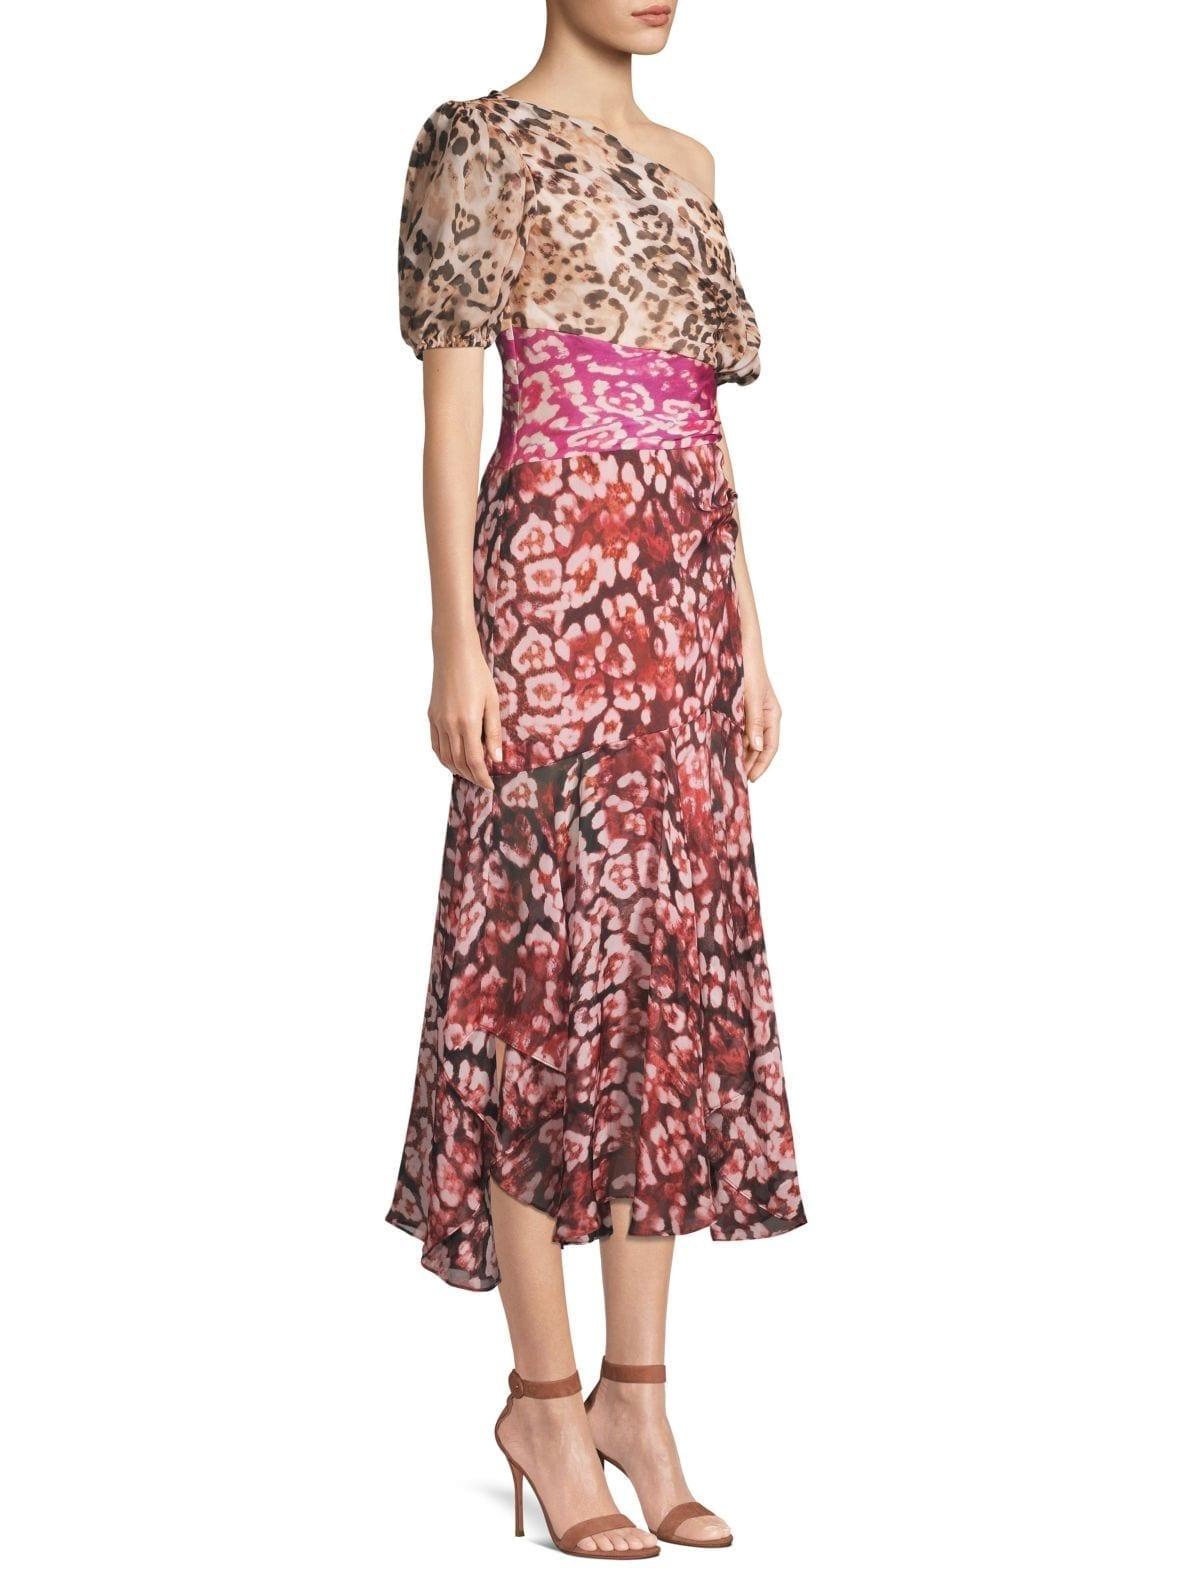 AMUR Jaylah Silk Chiffon One-Shouldered Multicolored Dress